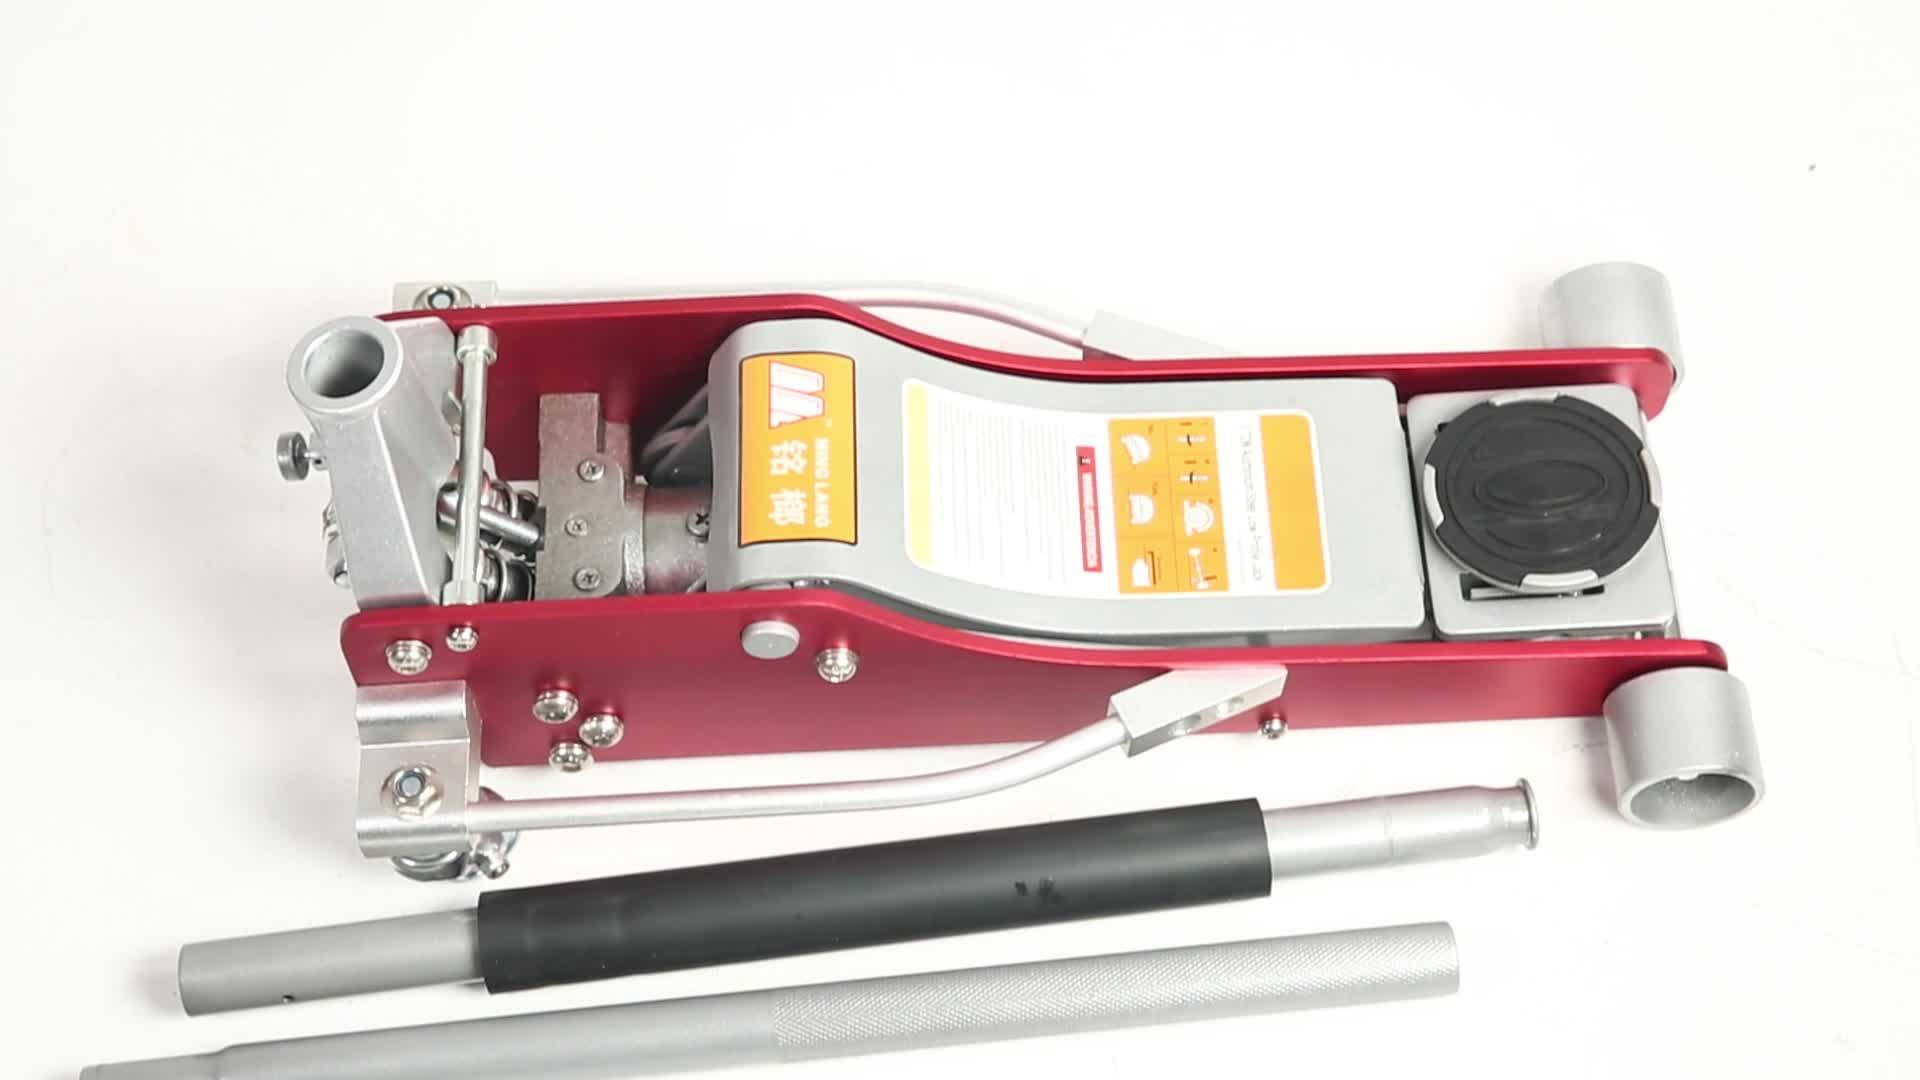 1. 5 टी एल्यूमीनियम स्टील रेसिंग जैक क्षैतिज मोटर वाहन कार मंजिल जैक